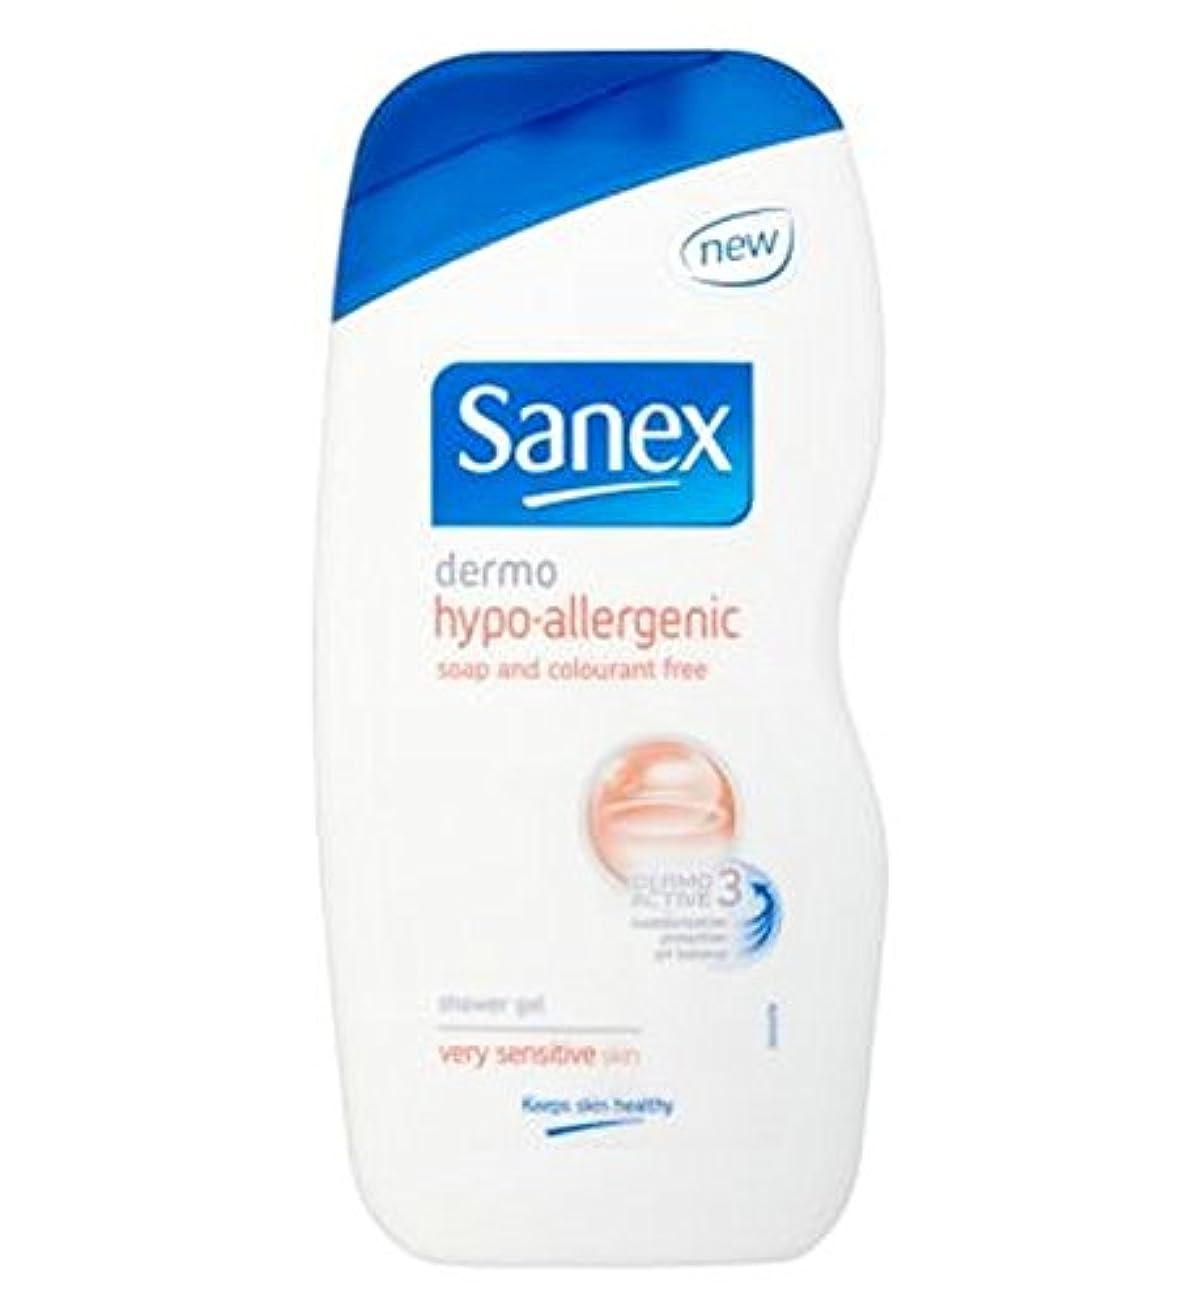 Sanex Hypoallergenic Shower Gel 500ml - Sanex低刺激性のシャワージェル500ミリリットル (Sanex) [並行輸入品]